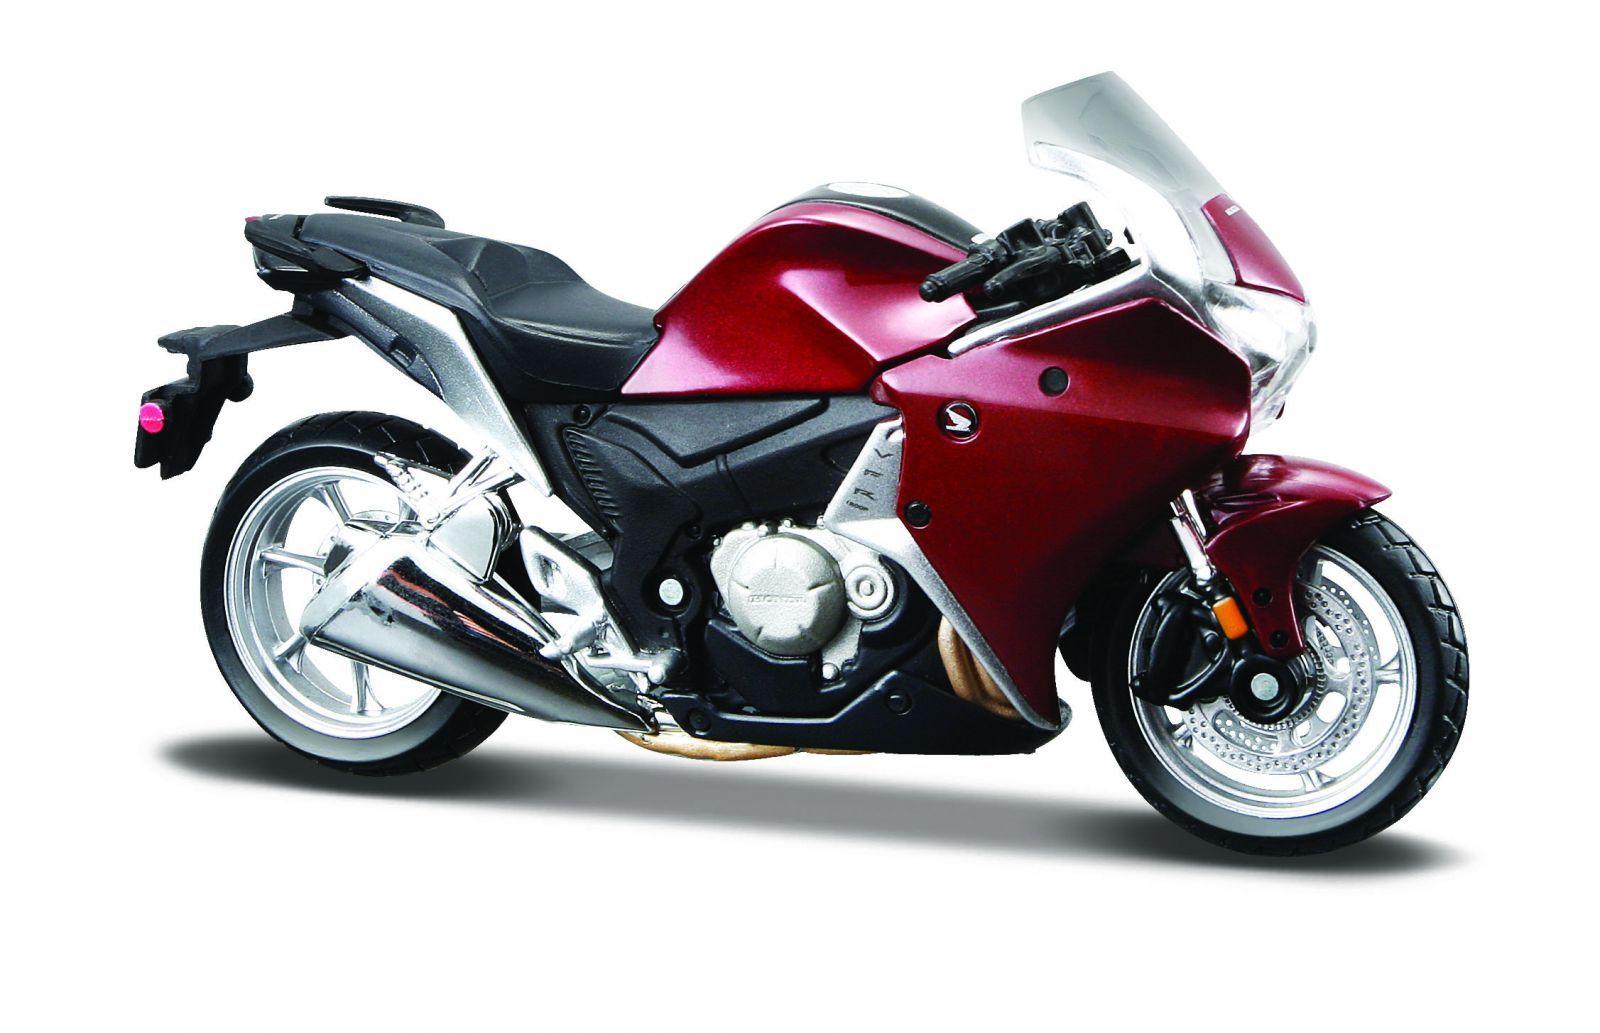 Maisto motorka bez podstavce - Honda VRF1200F 1:18 vínová Miasto